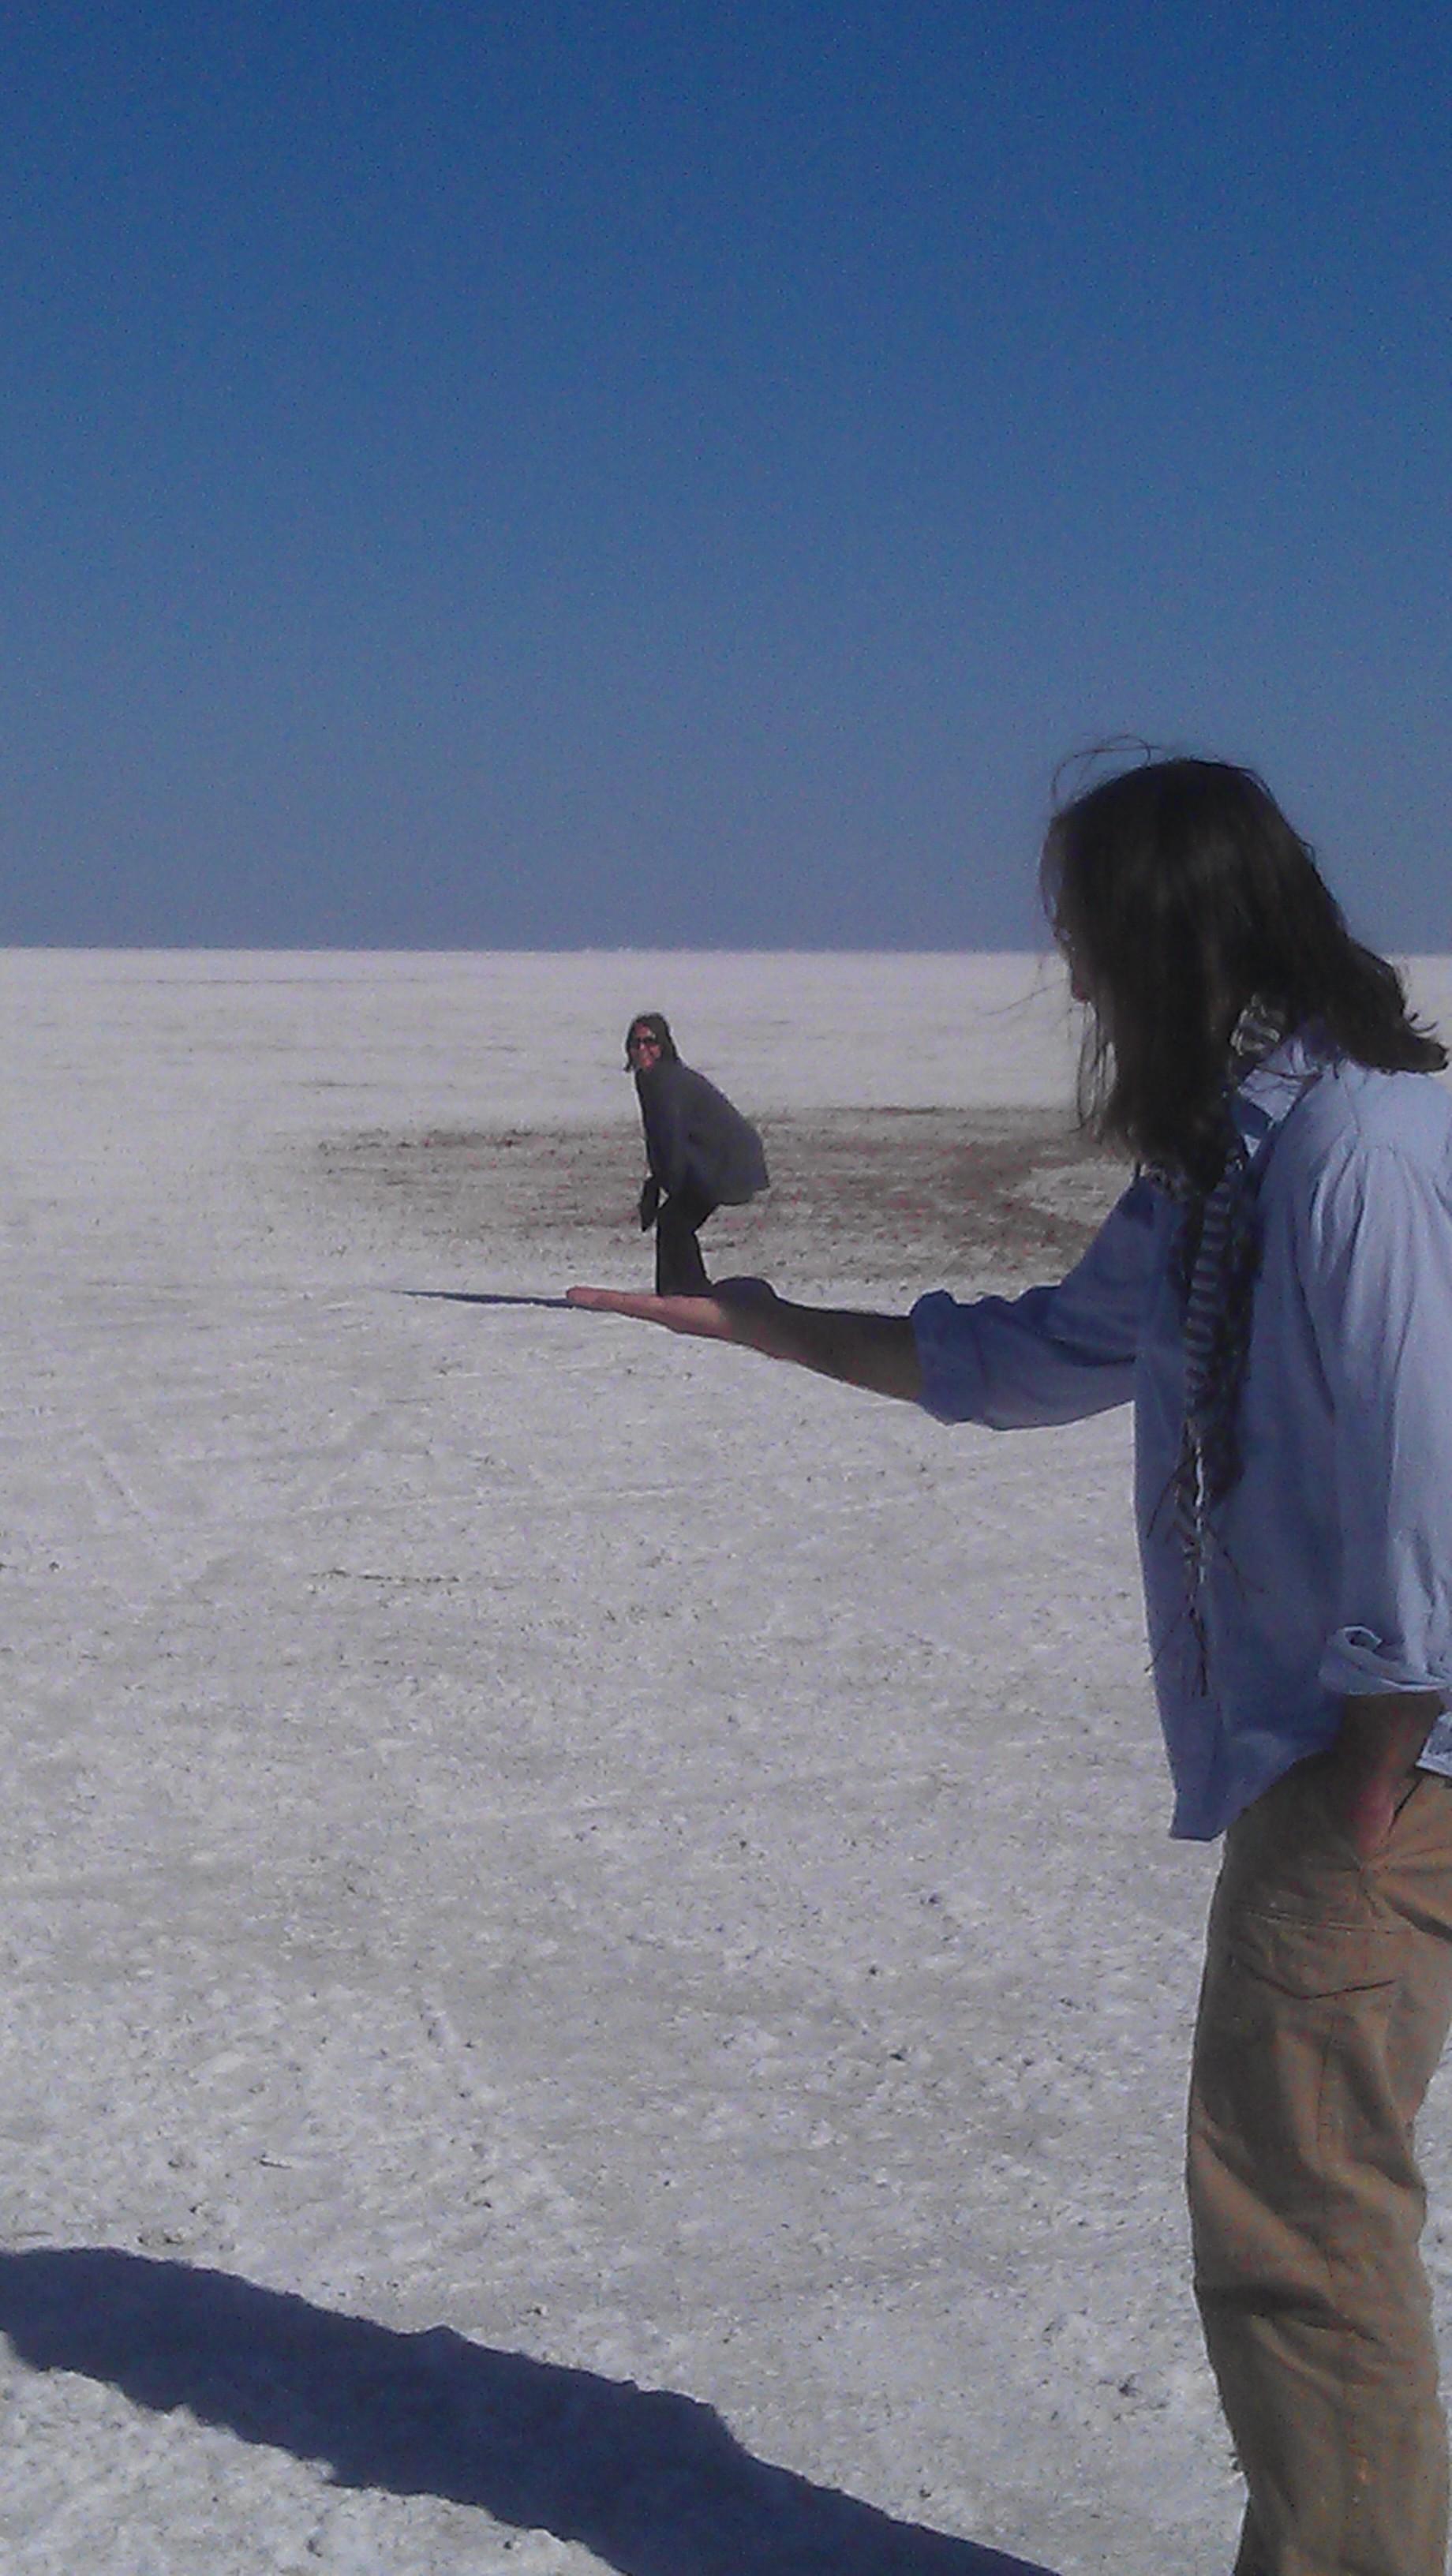 Salt Flats in Argentina